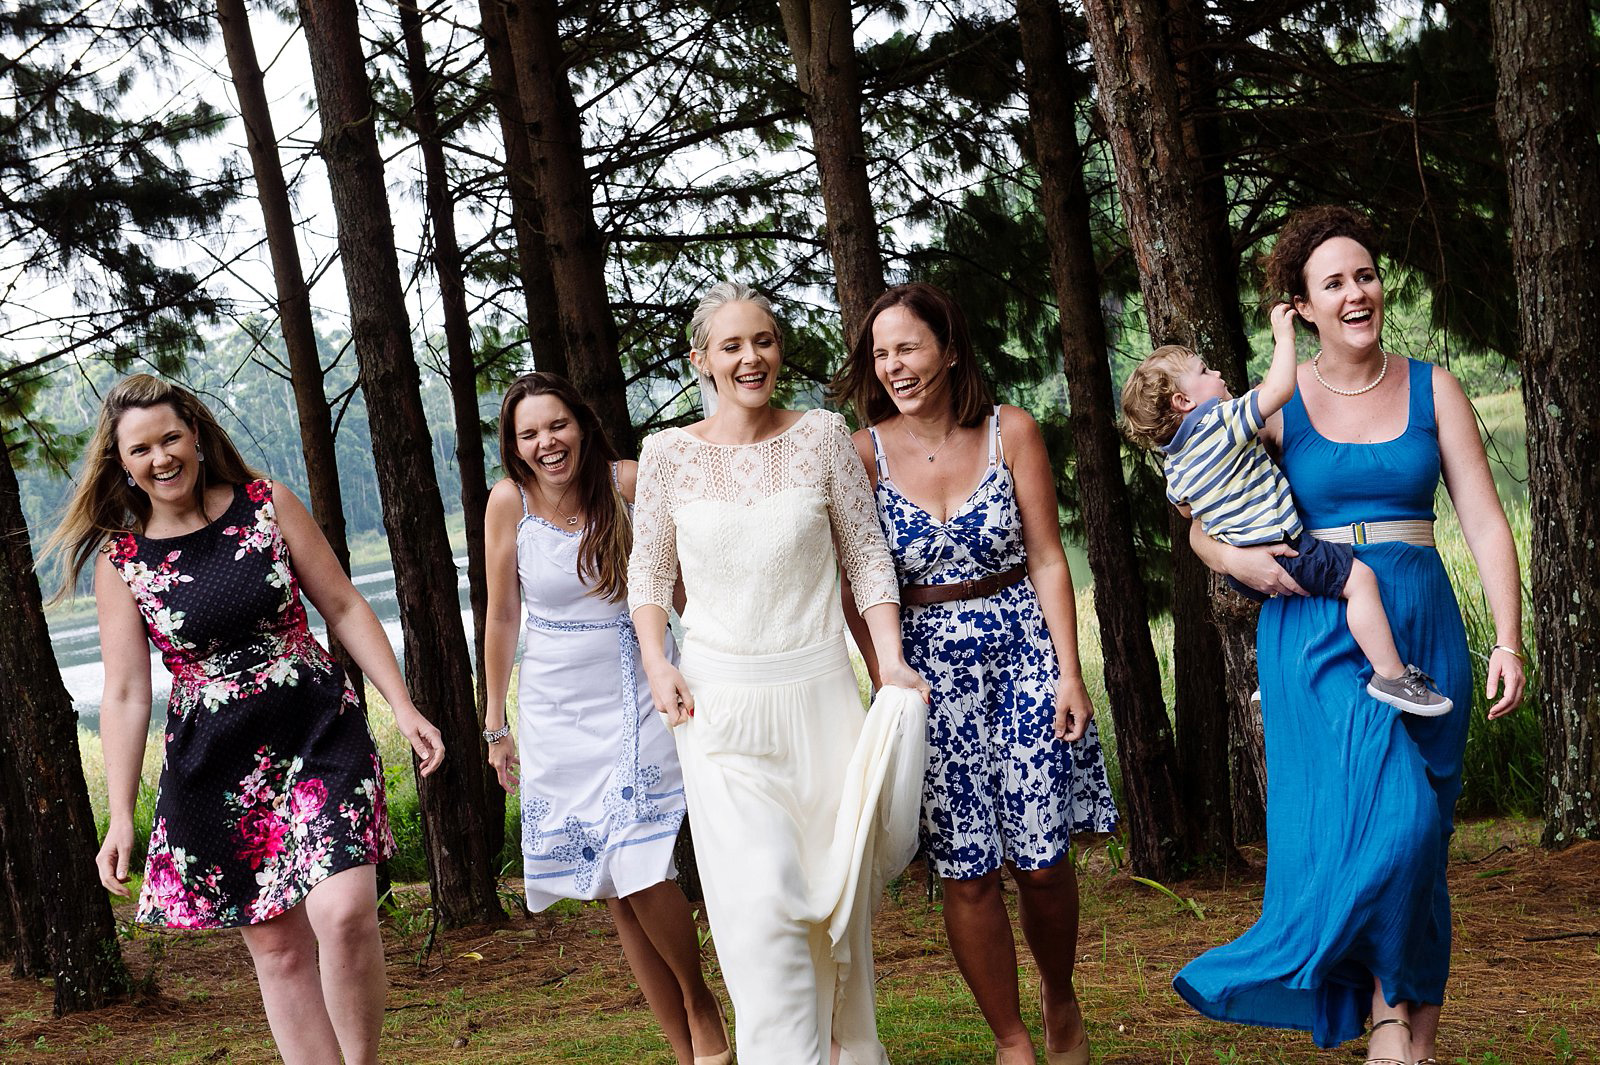 Haycroft Farm Midlands Wedding Top South African Photographer Jacki Bruniquel 040 582